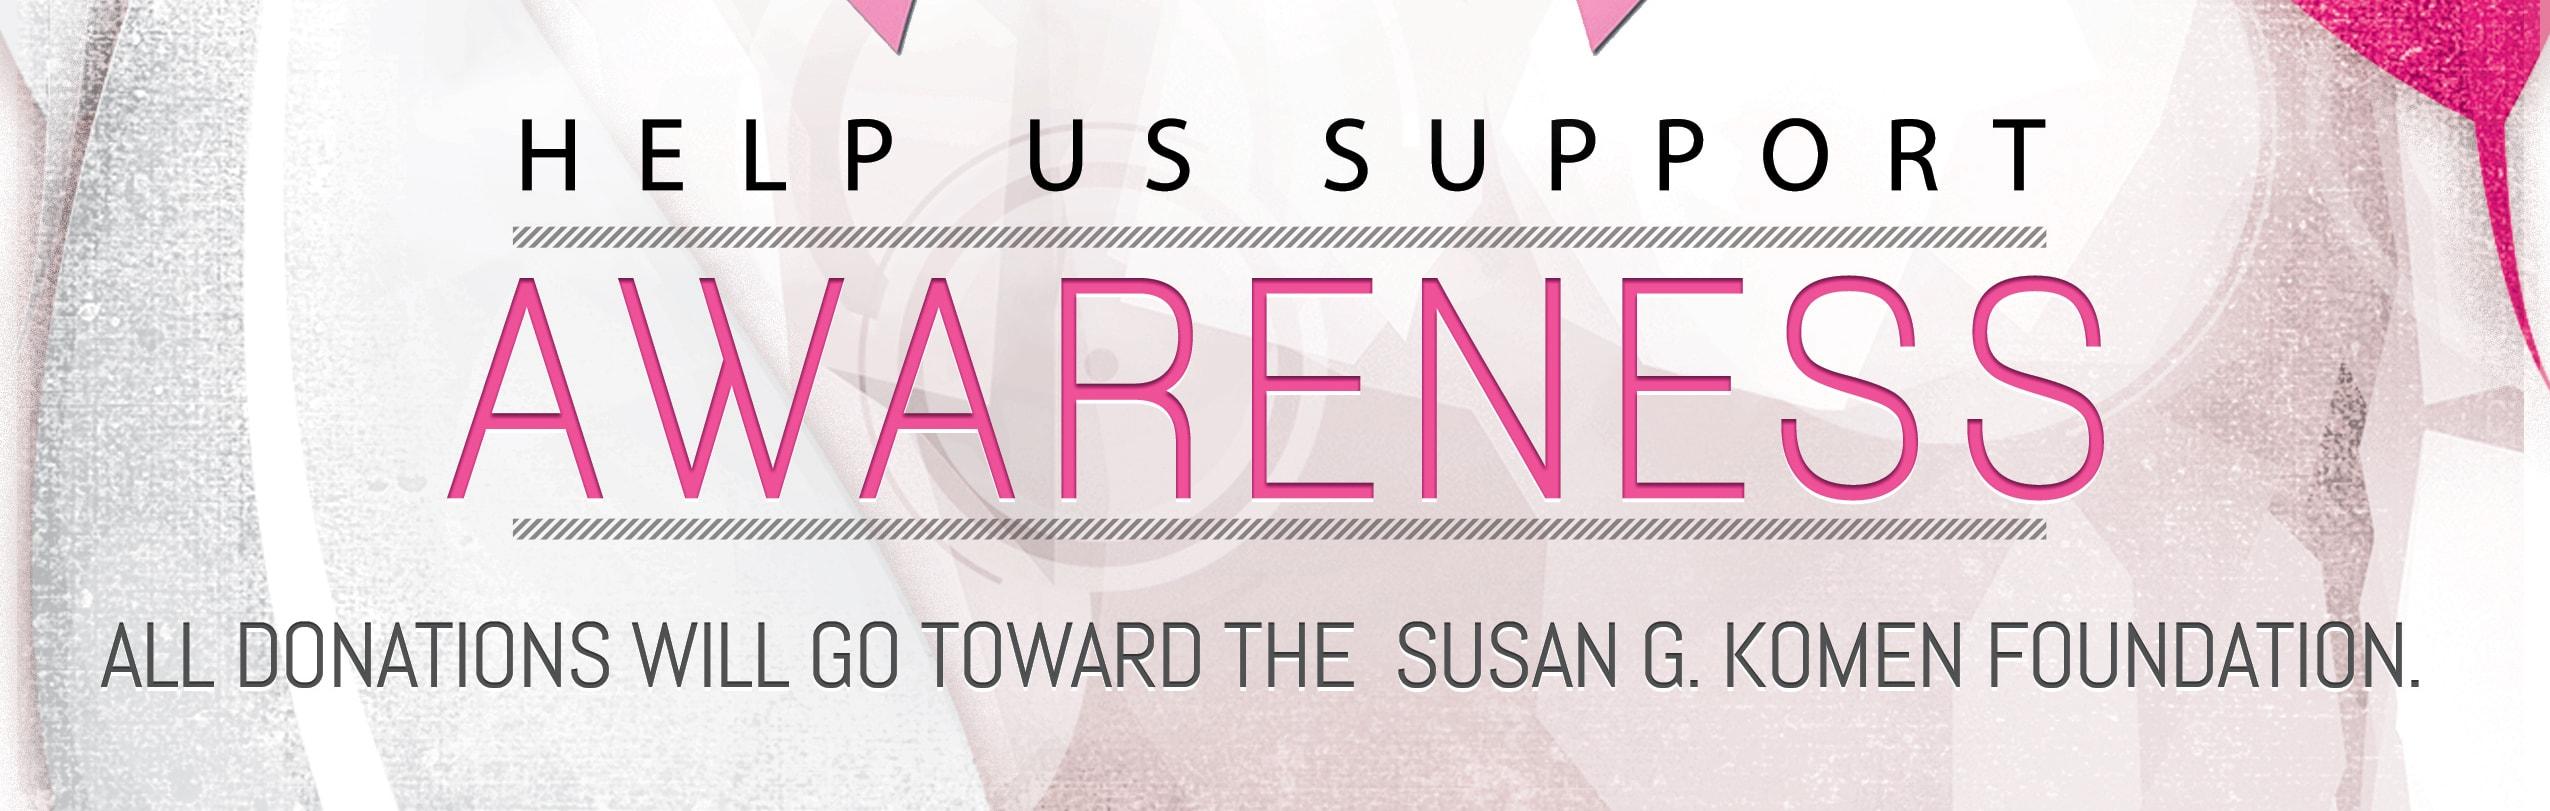 Support the Susan G. Komen Foundation